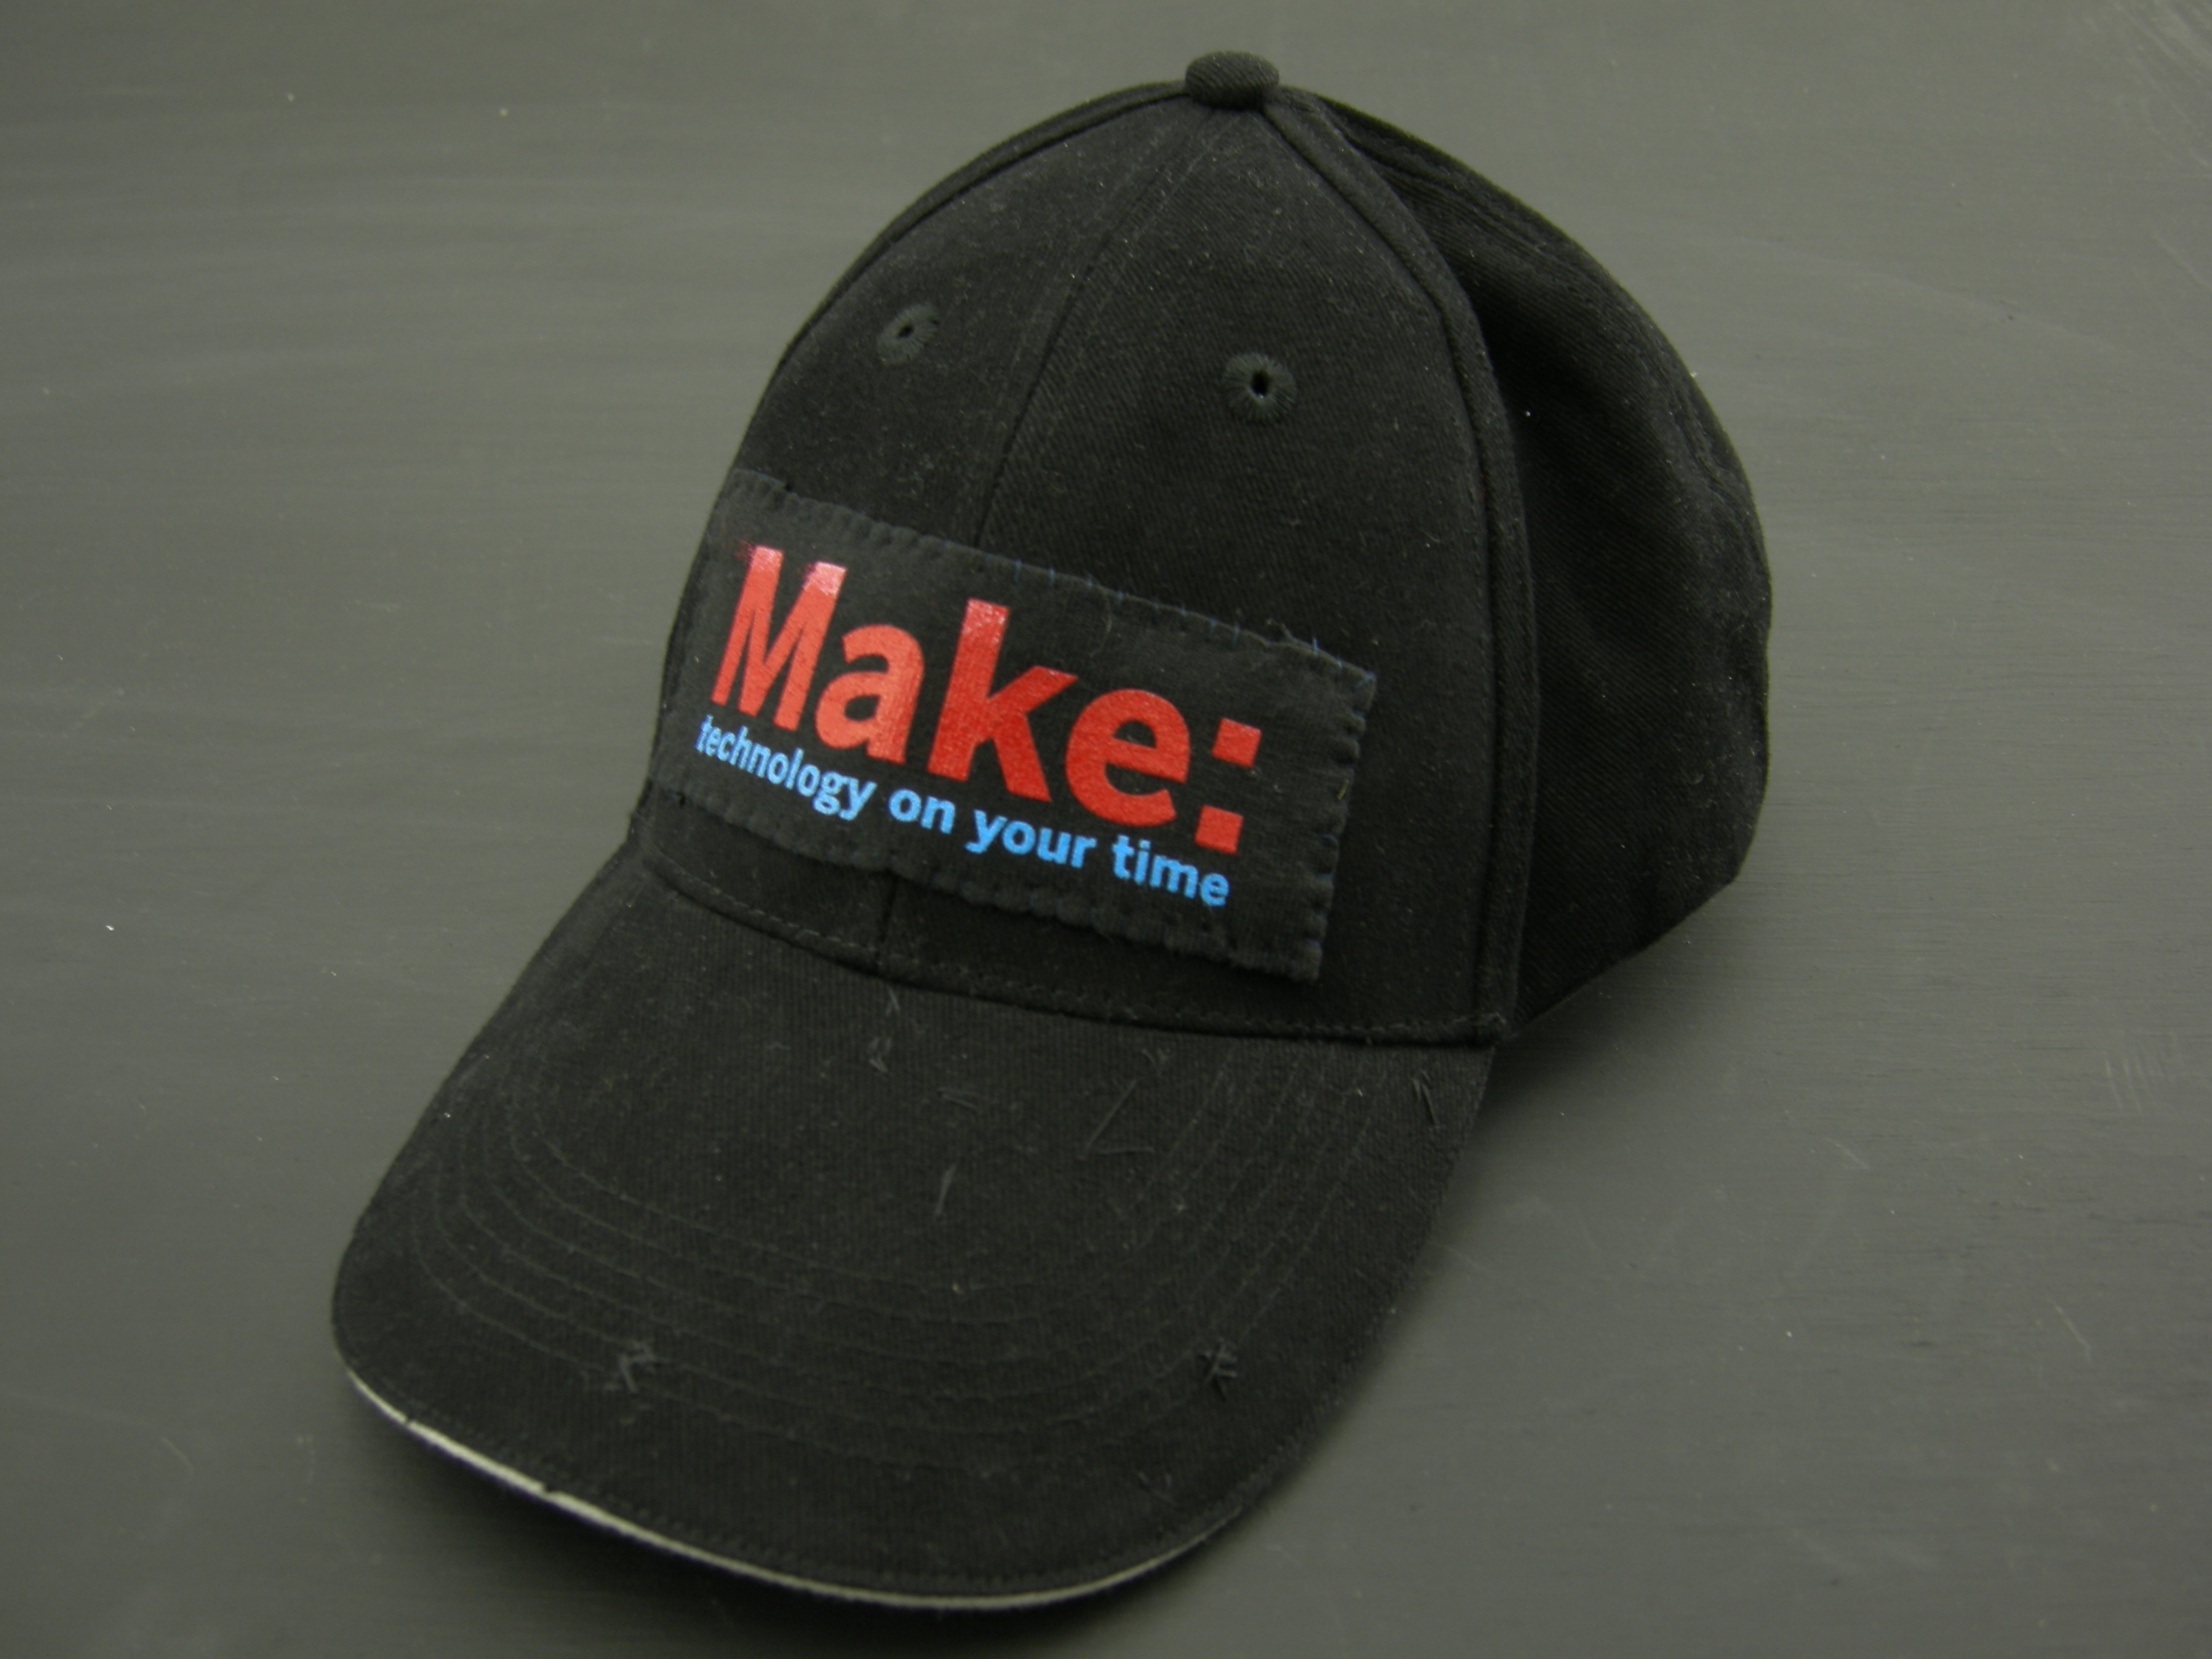 Tv-B-Gone Hat